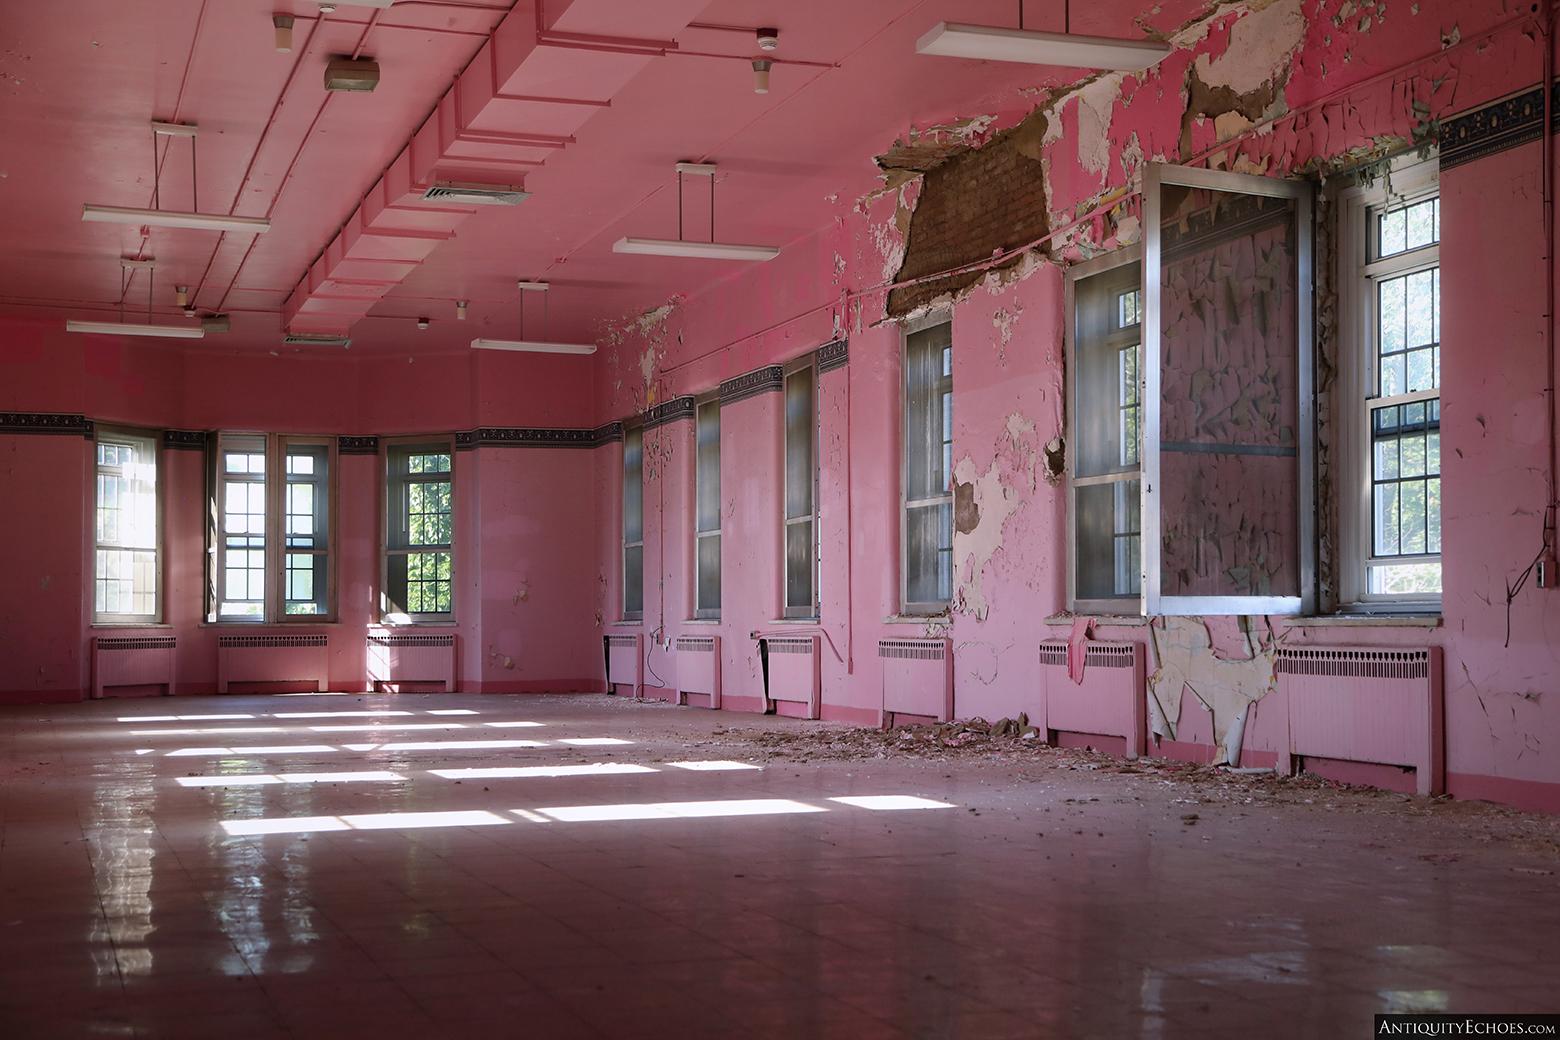 Allentown State Hospital - Top Floor Pink Ward